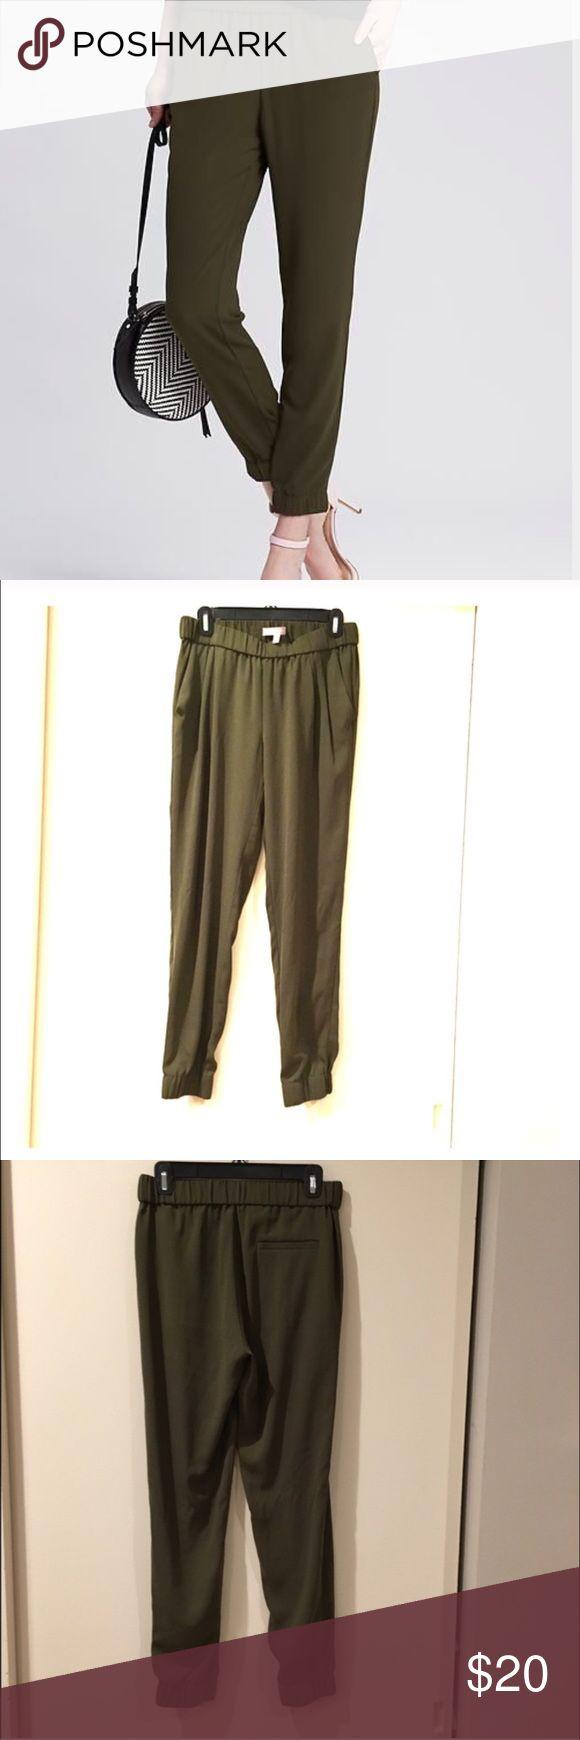 Silky draped olive pants Silky draped olive pants from banana republic nwot Banana Republic Pants